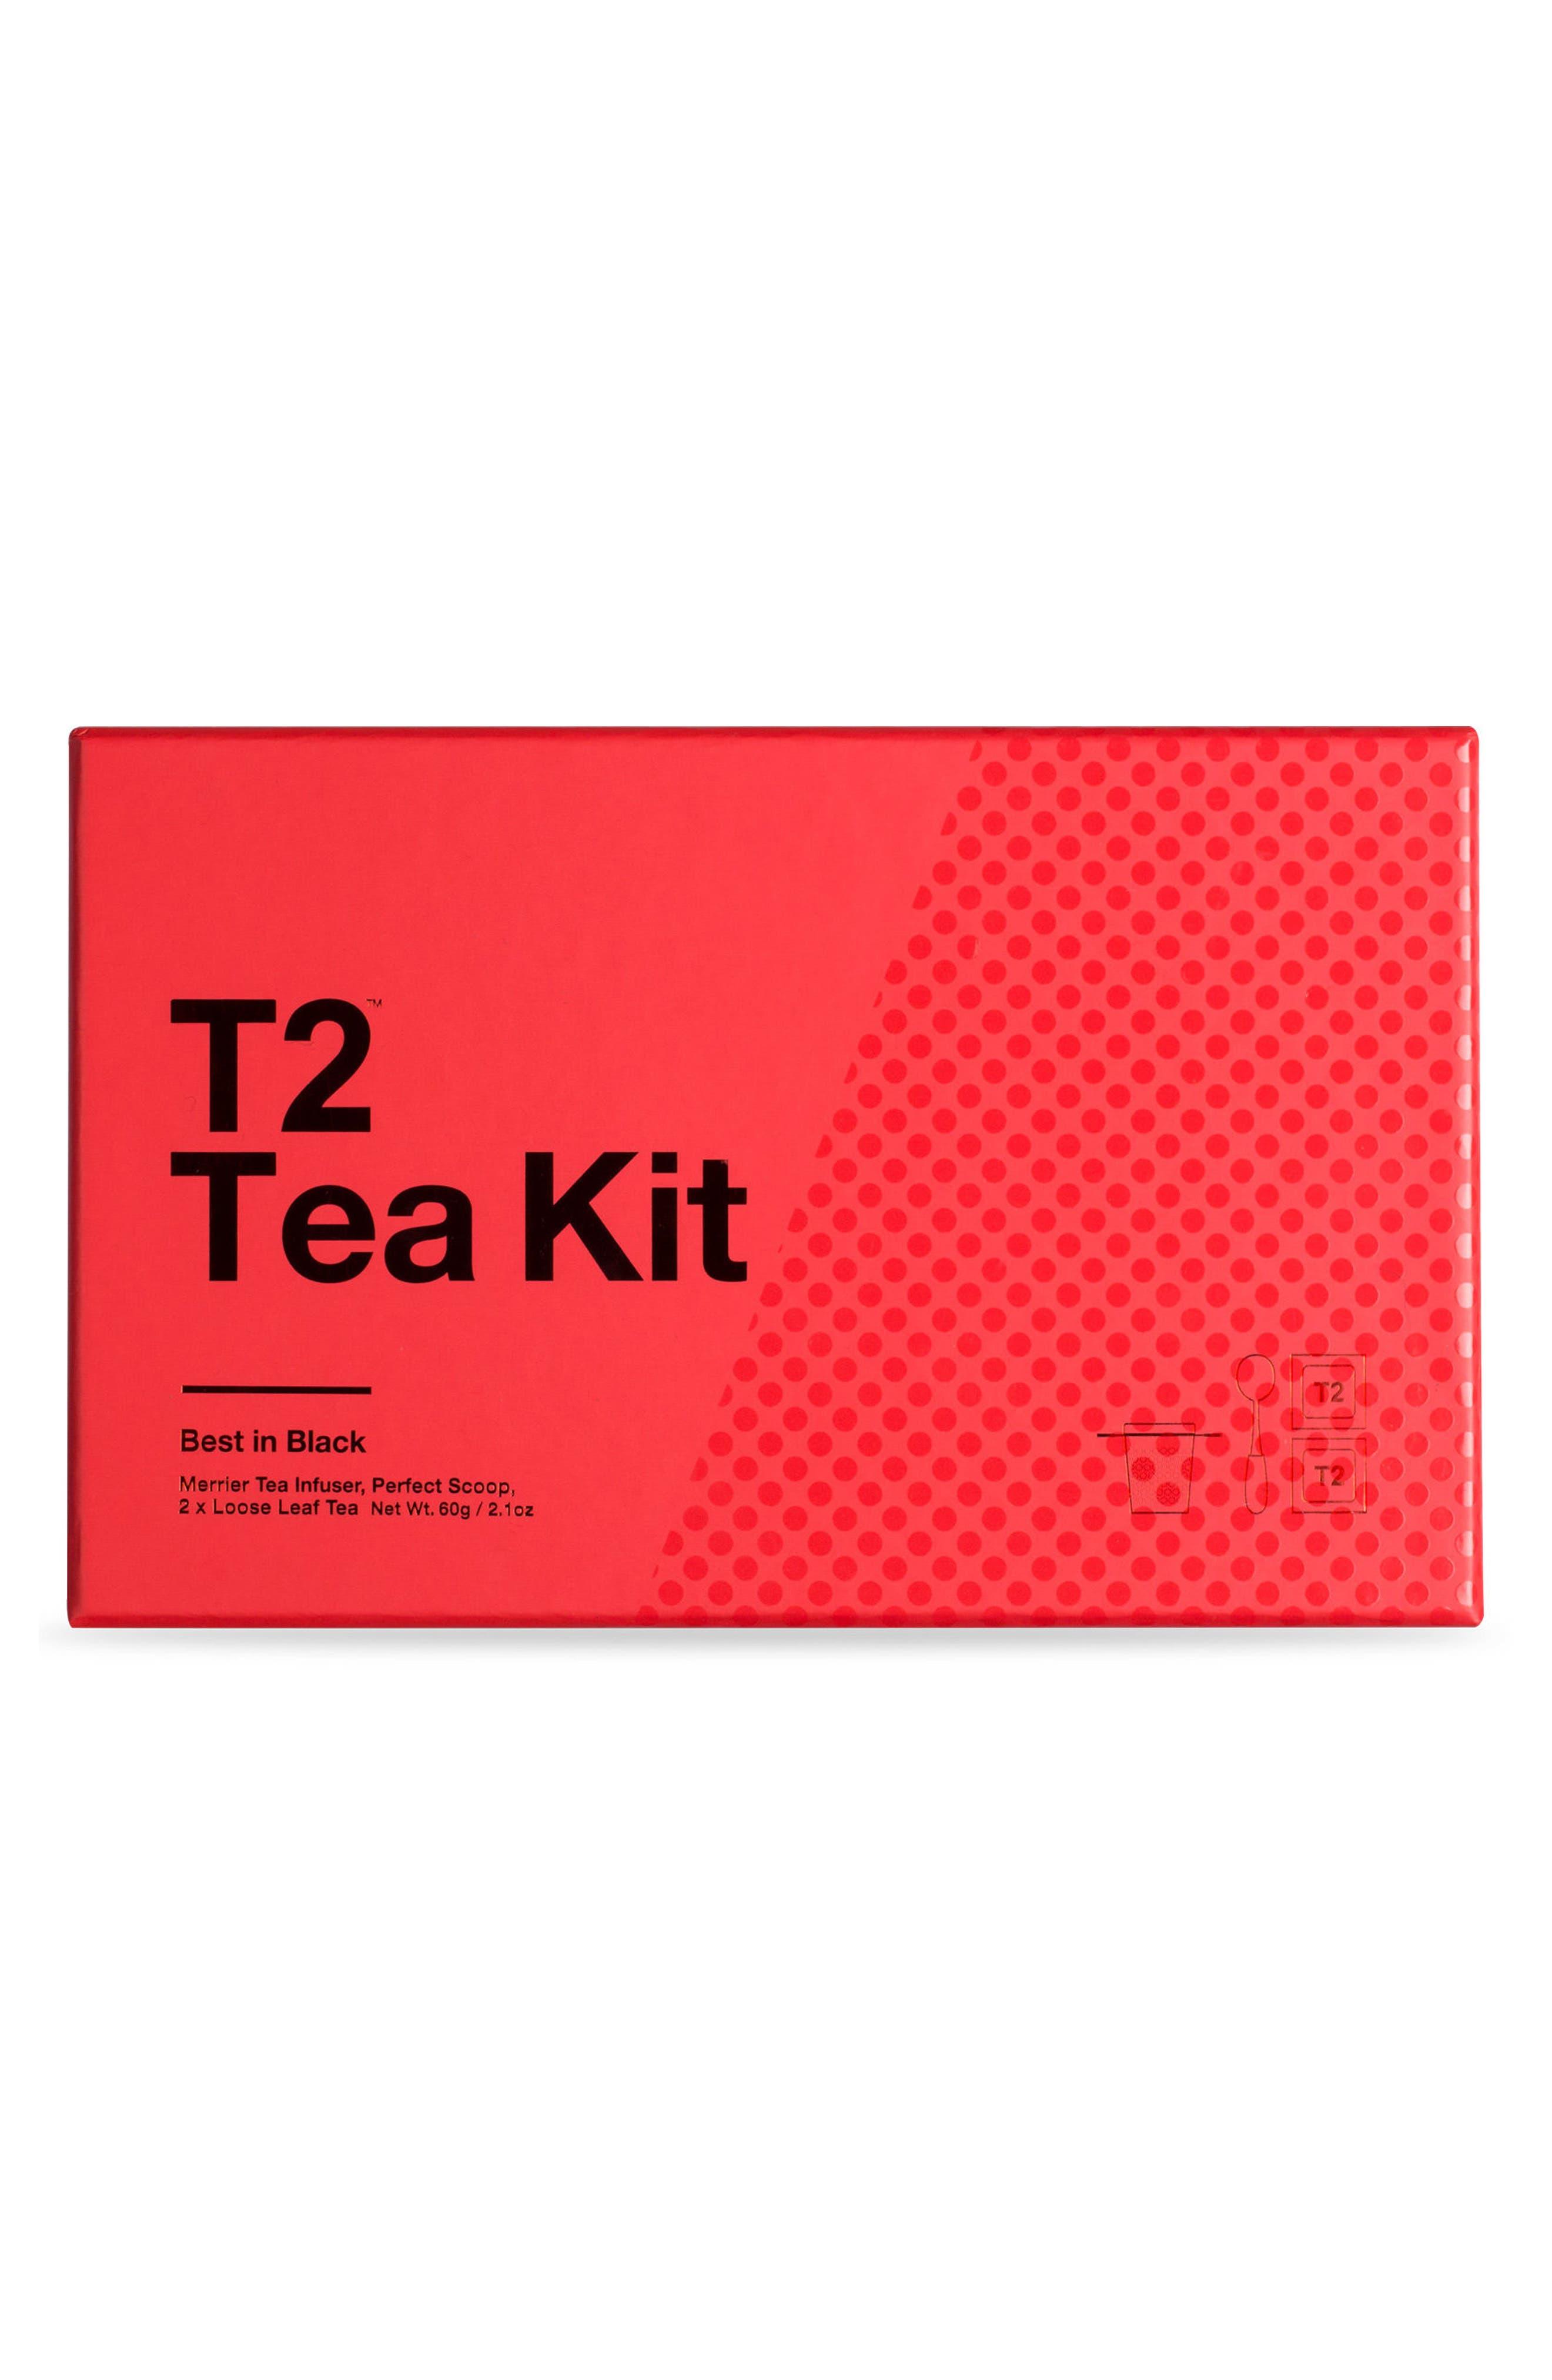 Alternate Image 1 Selected - T2 Tea Best in Black Loose Leaf Tea Box Set